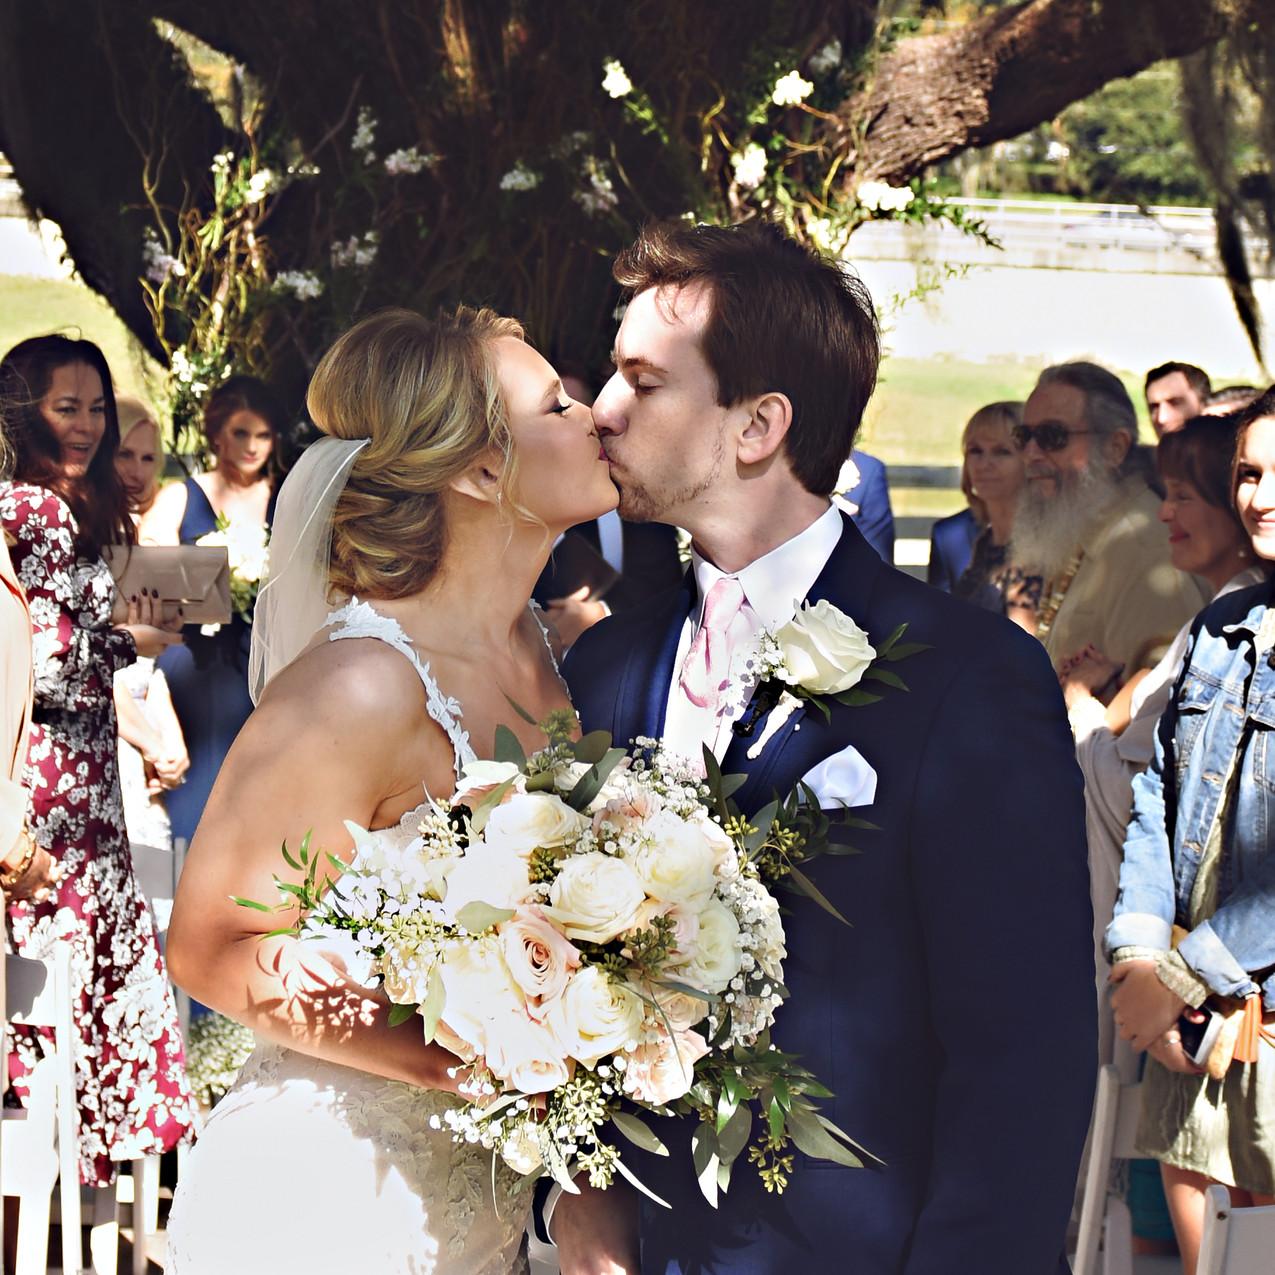 A final kiss